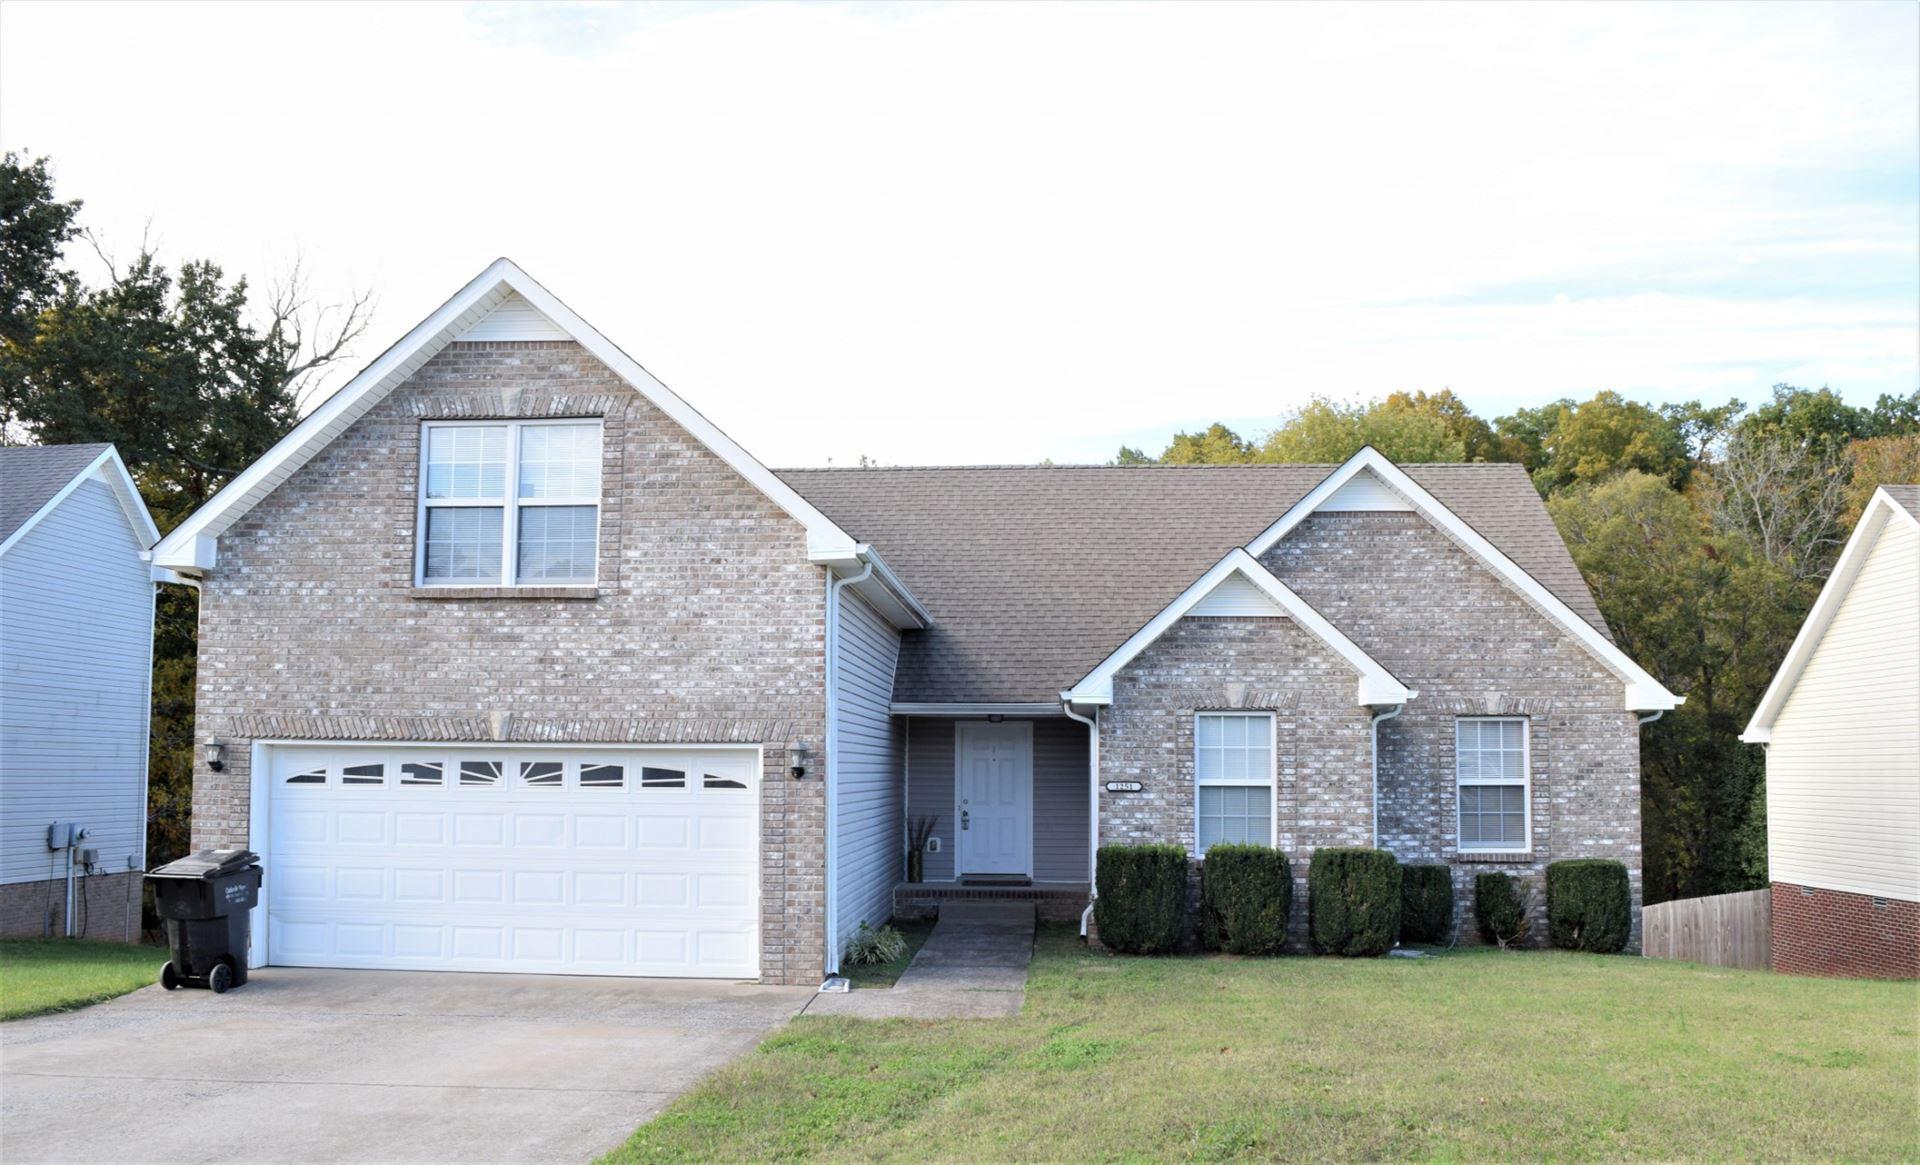 1251 Viewmont Dr, Clarksville, TN 37040 - MLS#: 2303734